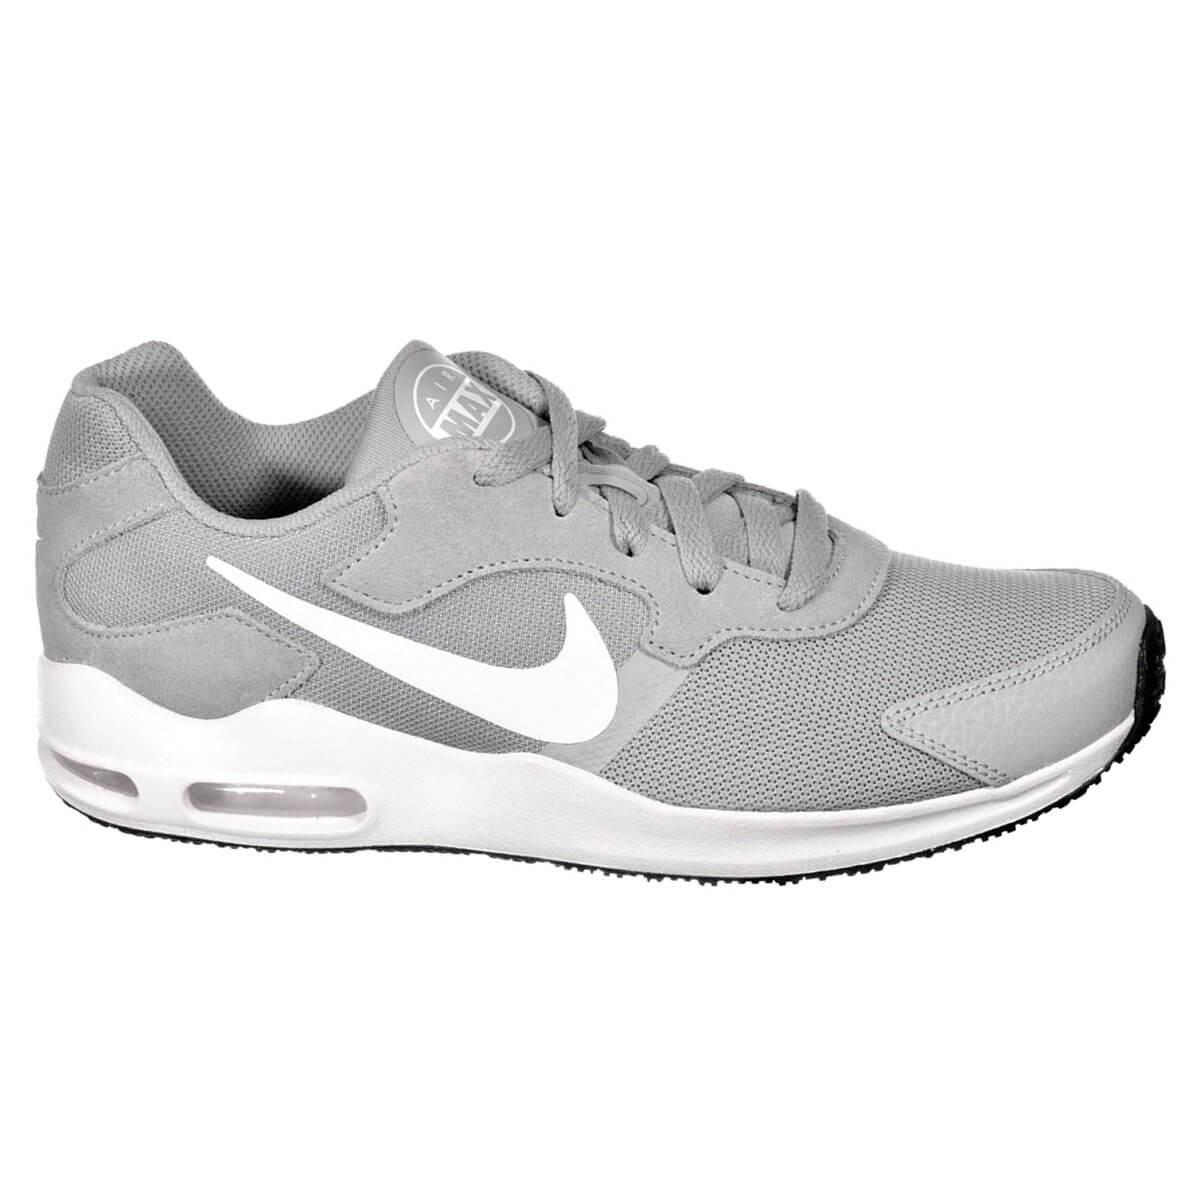 93e24b2b22 Tênis Masculino Nike Air Max Guile 916768-001 - Cinza/Branco ...